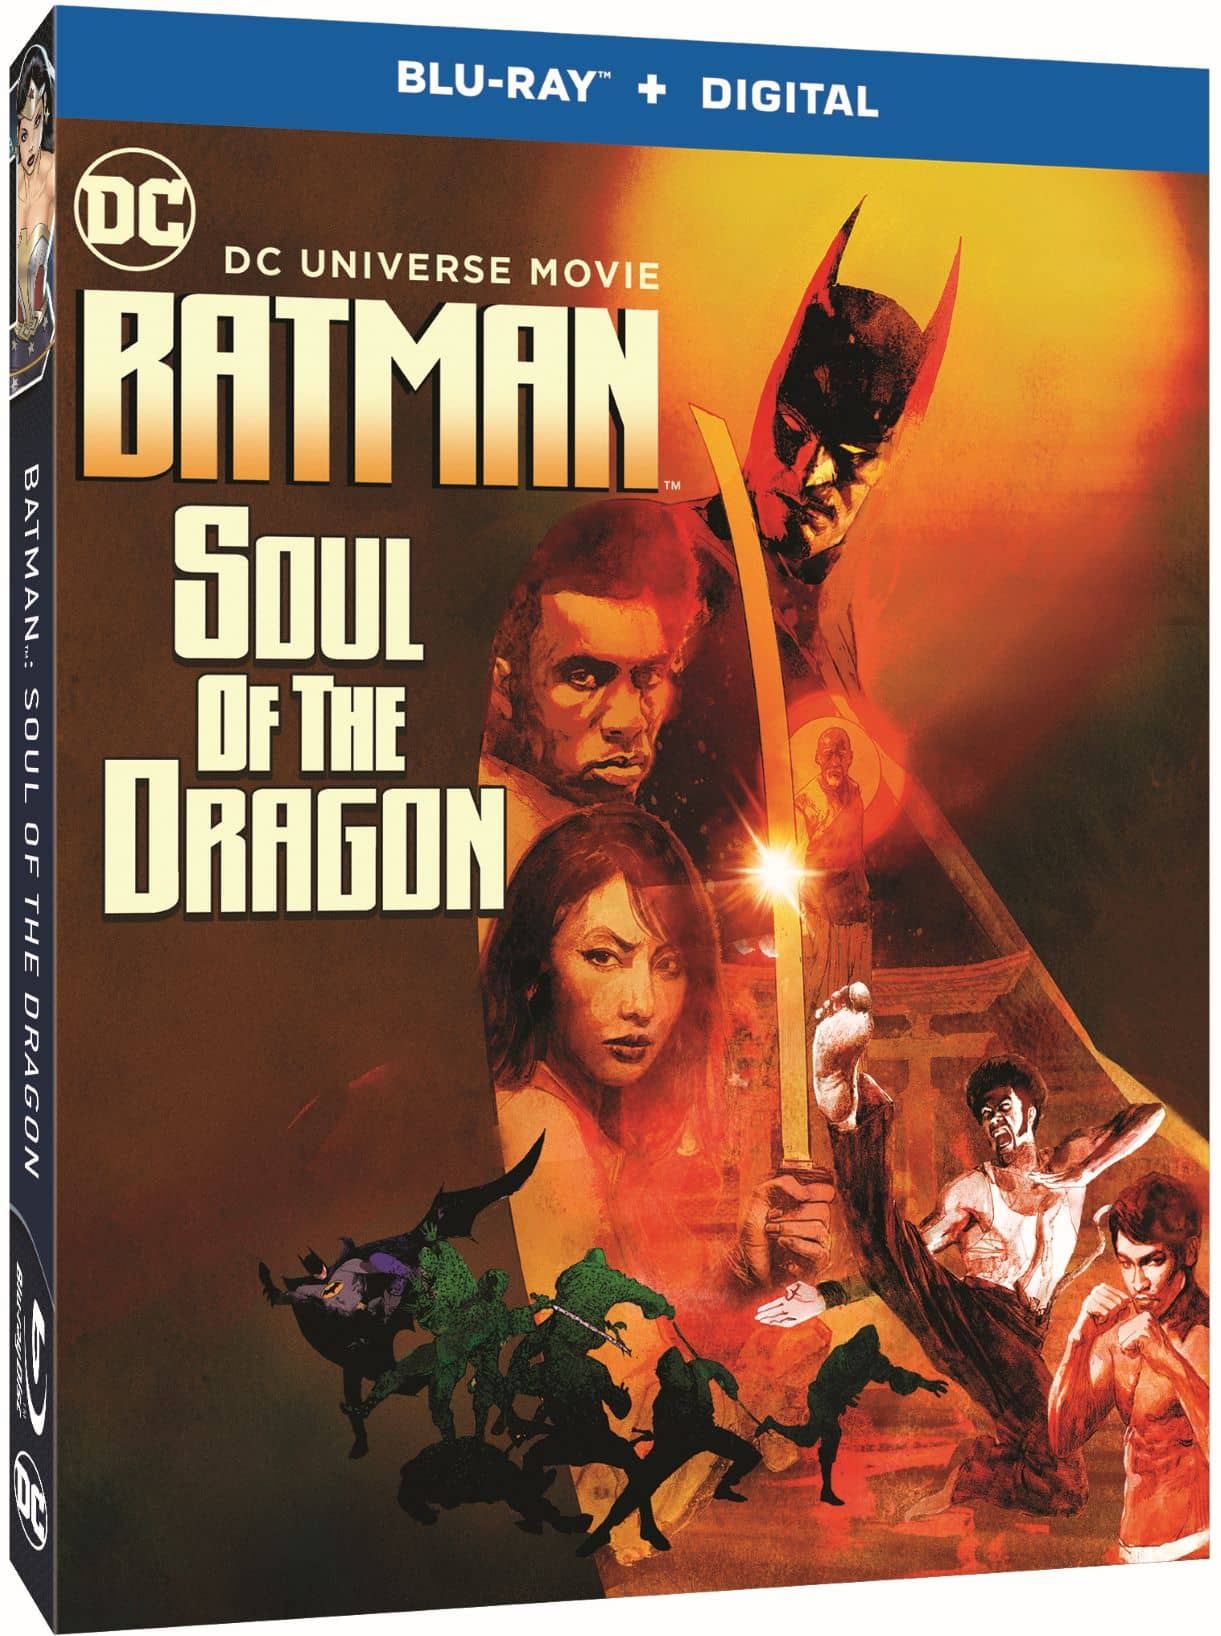 Batman SotD 1000742976 BD OSLV 3D TEMP DOM SKEW 002